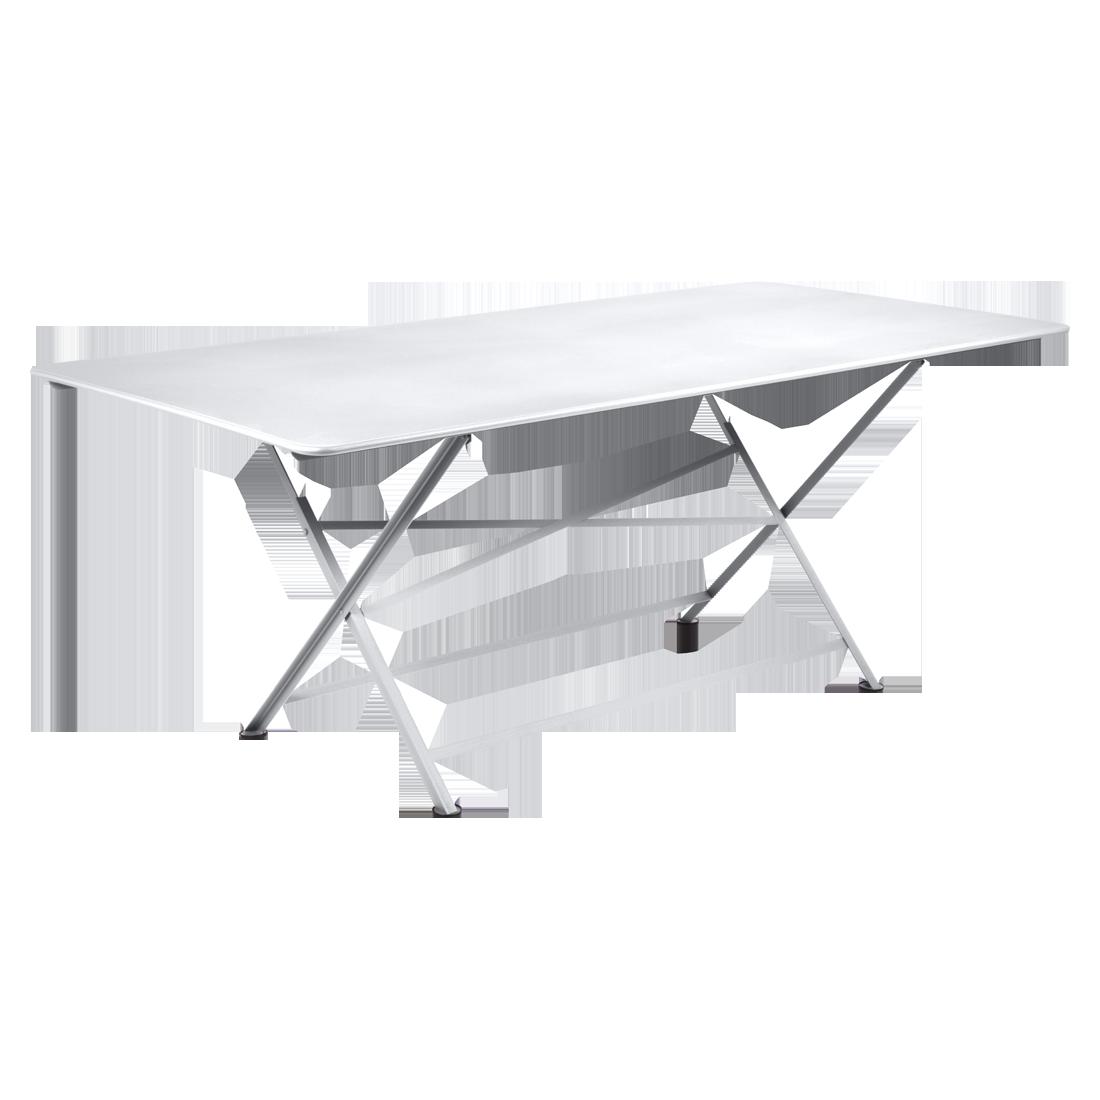 table de jardin, table metal, table de jardin pliante, table metal pliante, table fermob blanche